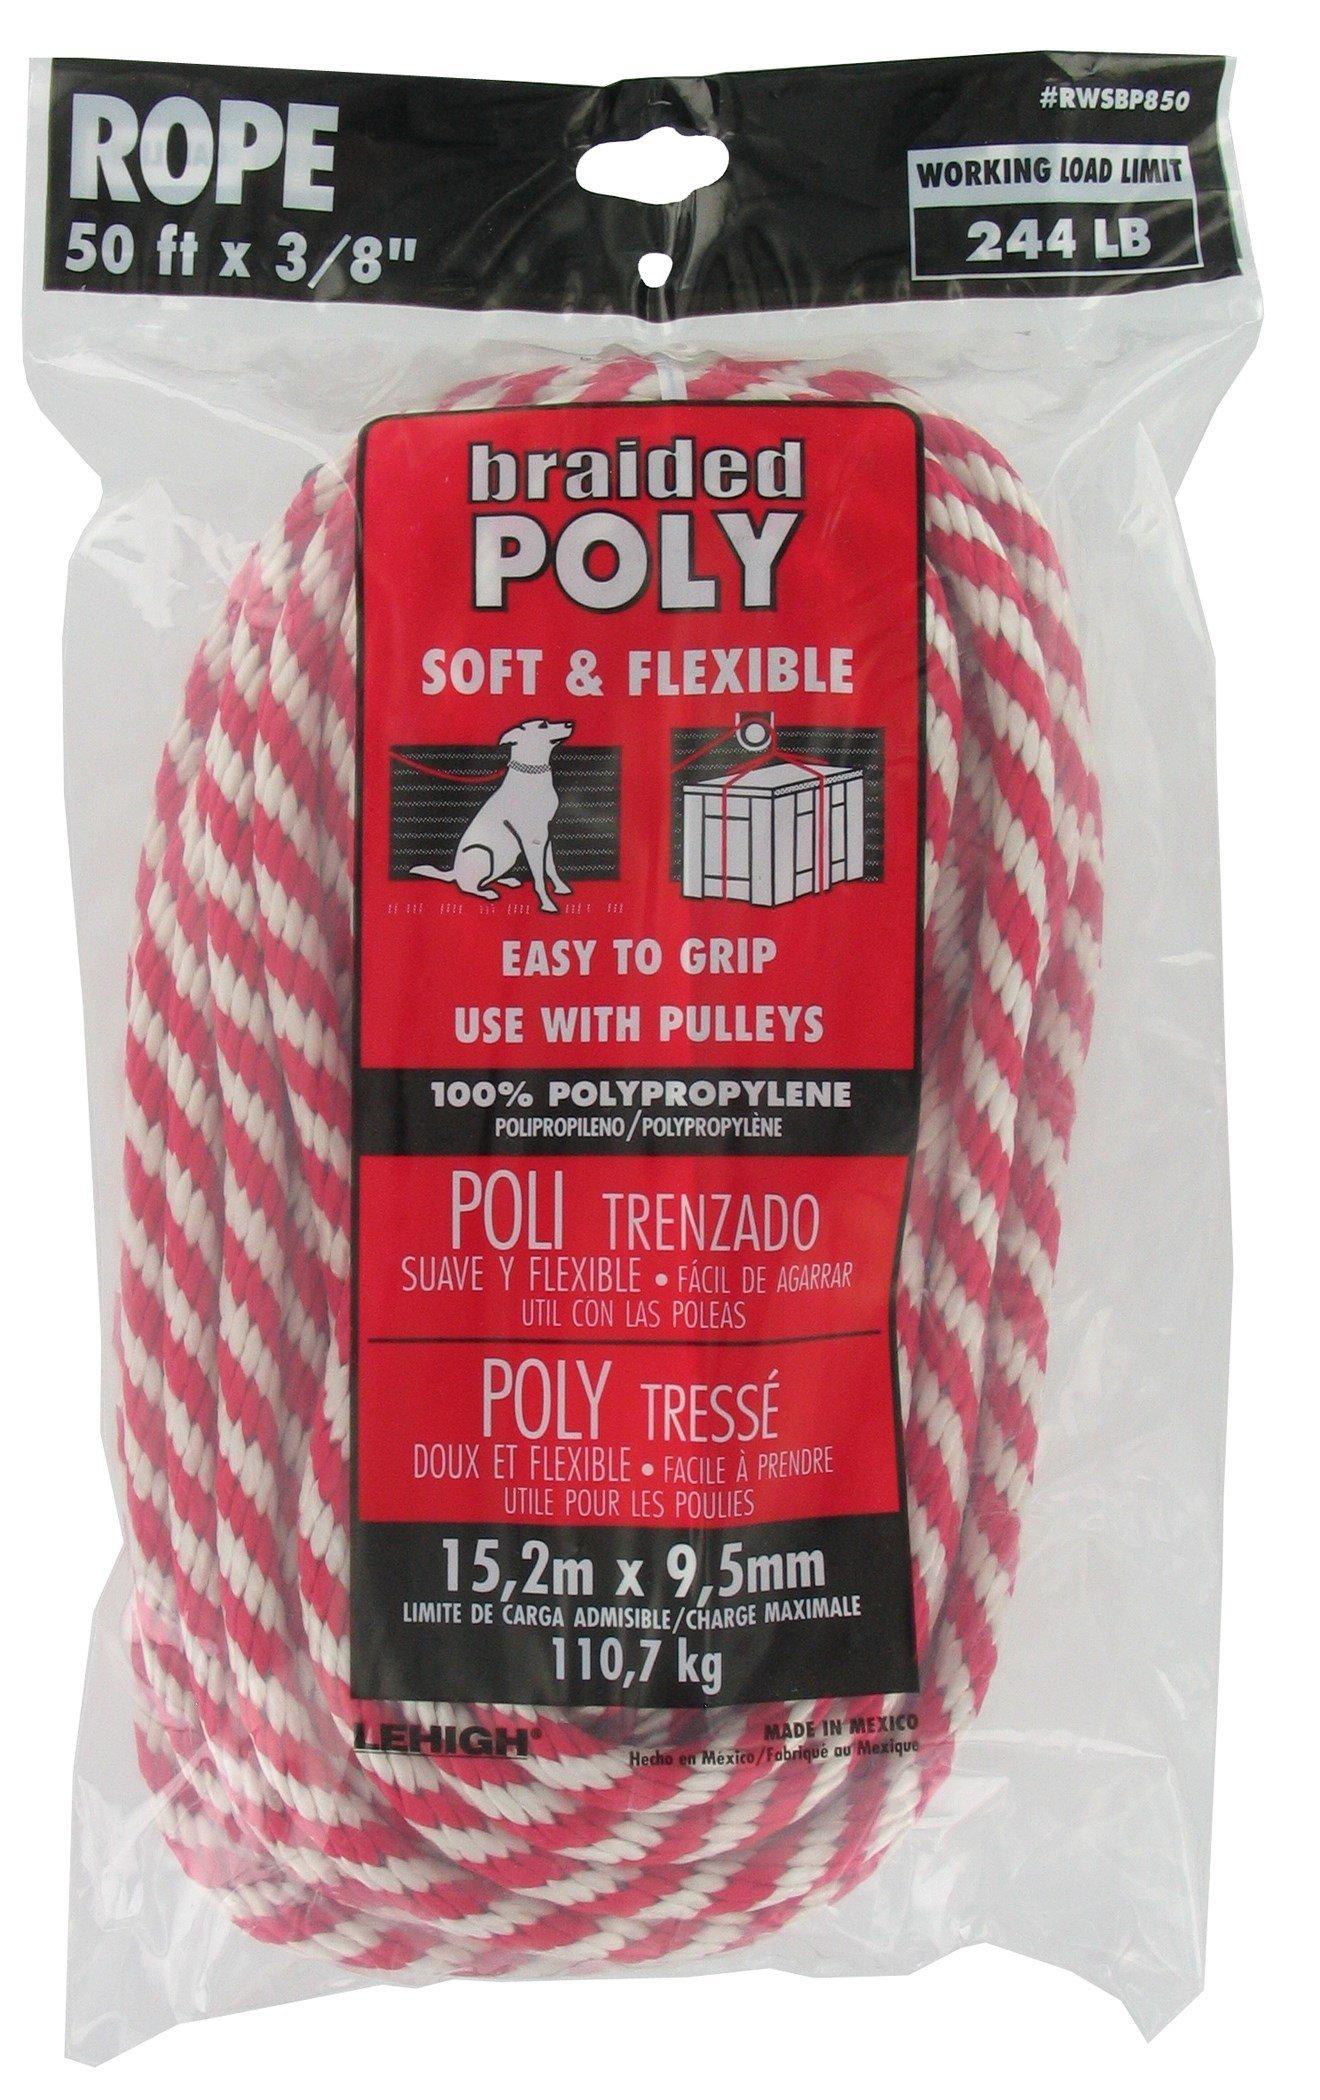 Lehigh Group RWSBP850W Polypropylene Solid Braid Derby Rope, 3/8'' x 50', Red/White